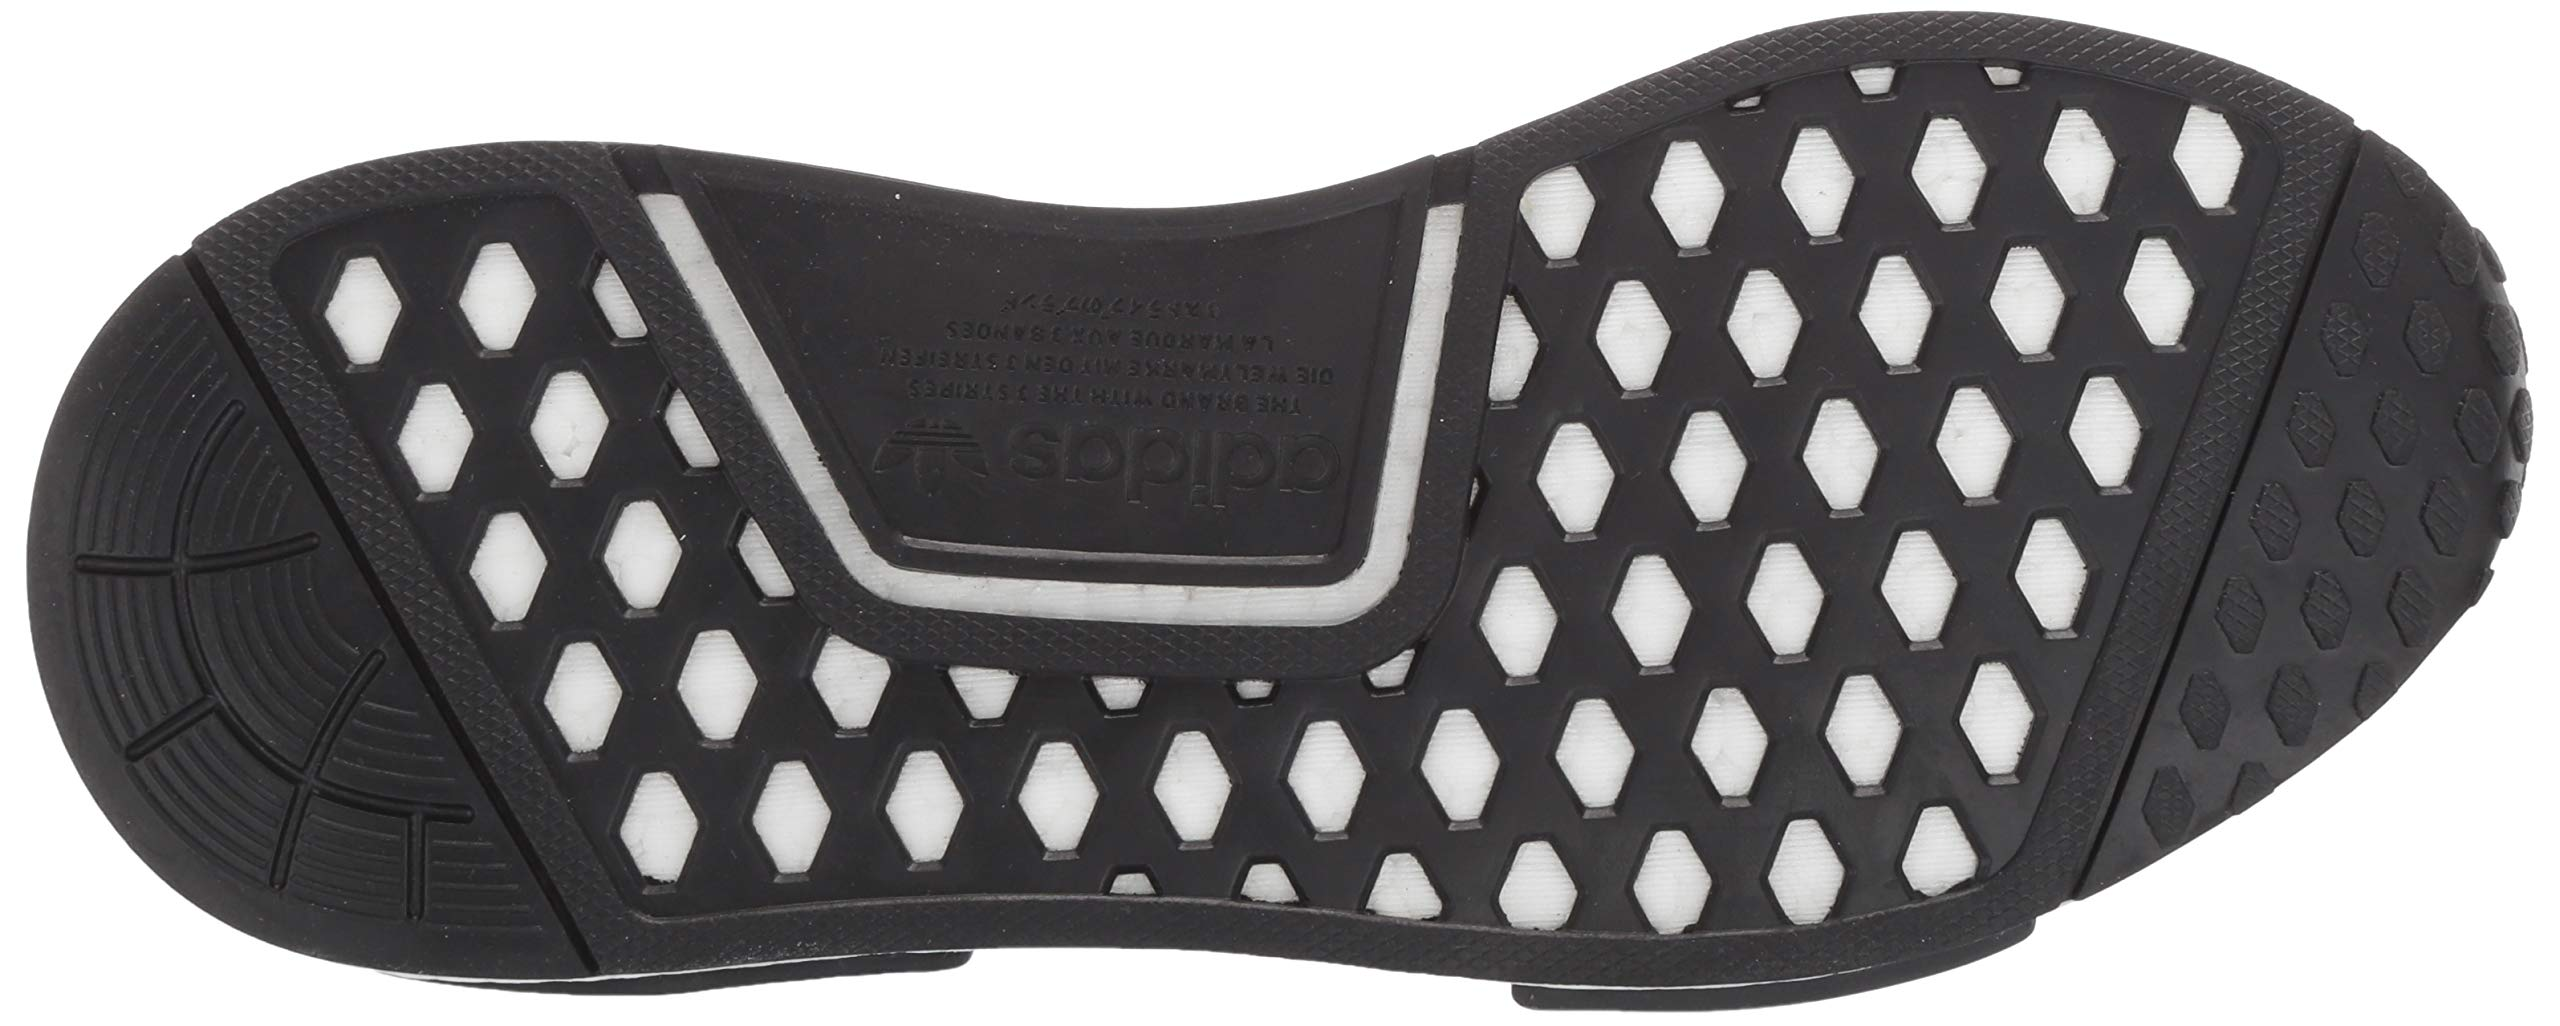 adidas Originals NMD_R1 Running Shoe True Blue/Utility Black, 3.5 M US Big Kid by adidas Originals (Image #3)